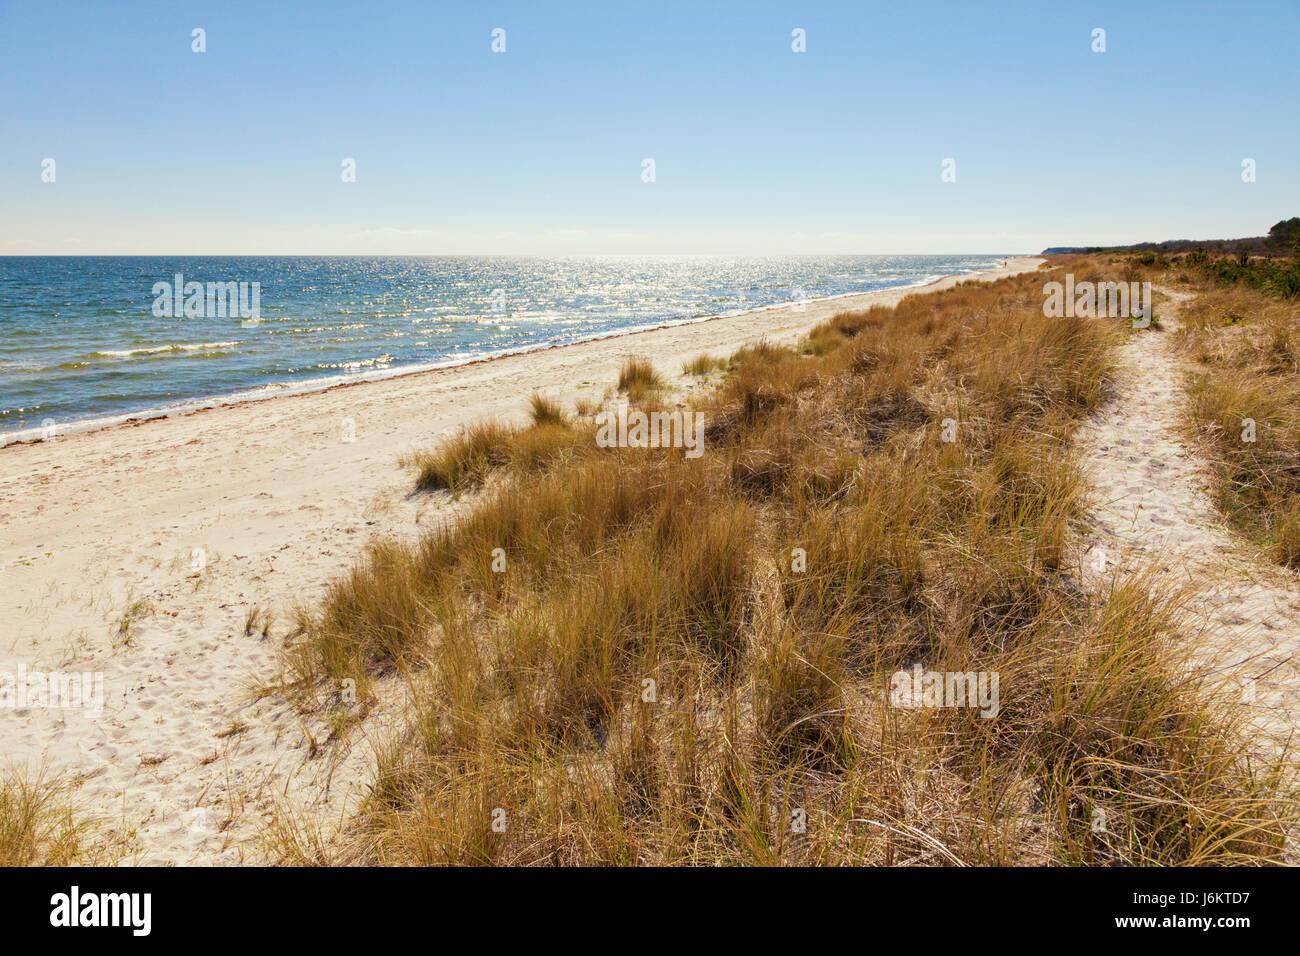 Beach and dunes at Grenaa, Baltic Sea coast of Djursland peninsula, Jutland, Denmark - Stock Image